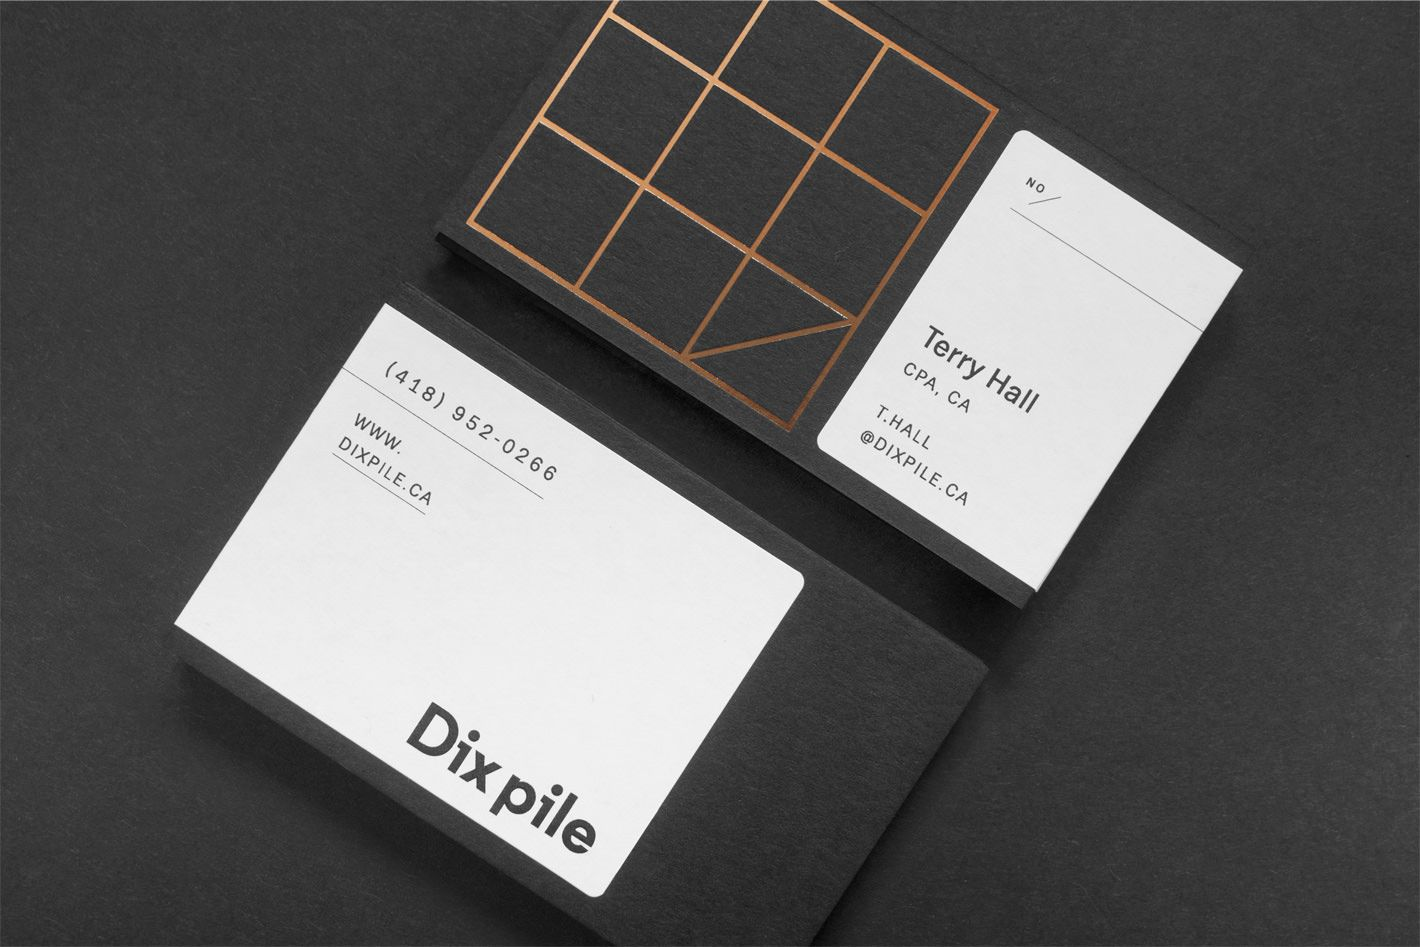 Dix pile - Branding | Tarjetas visita | Pinterest | Branding design ...